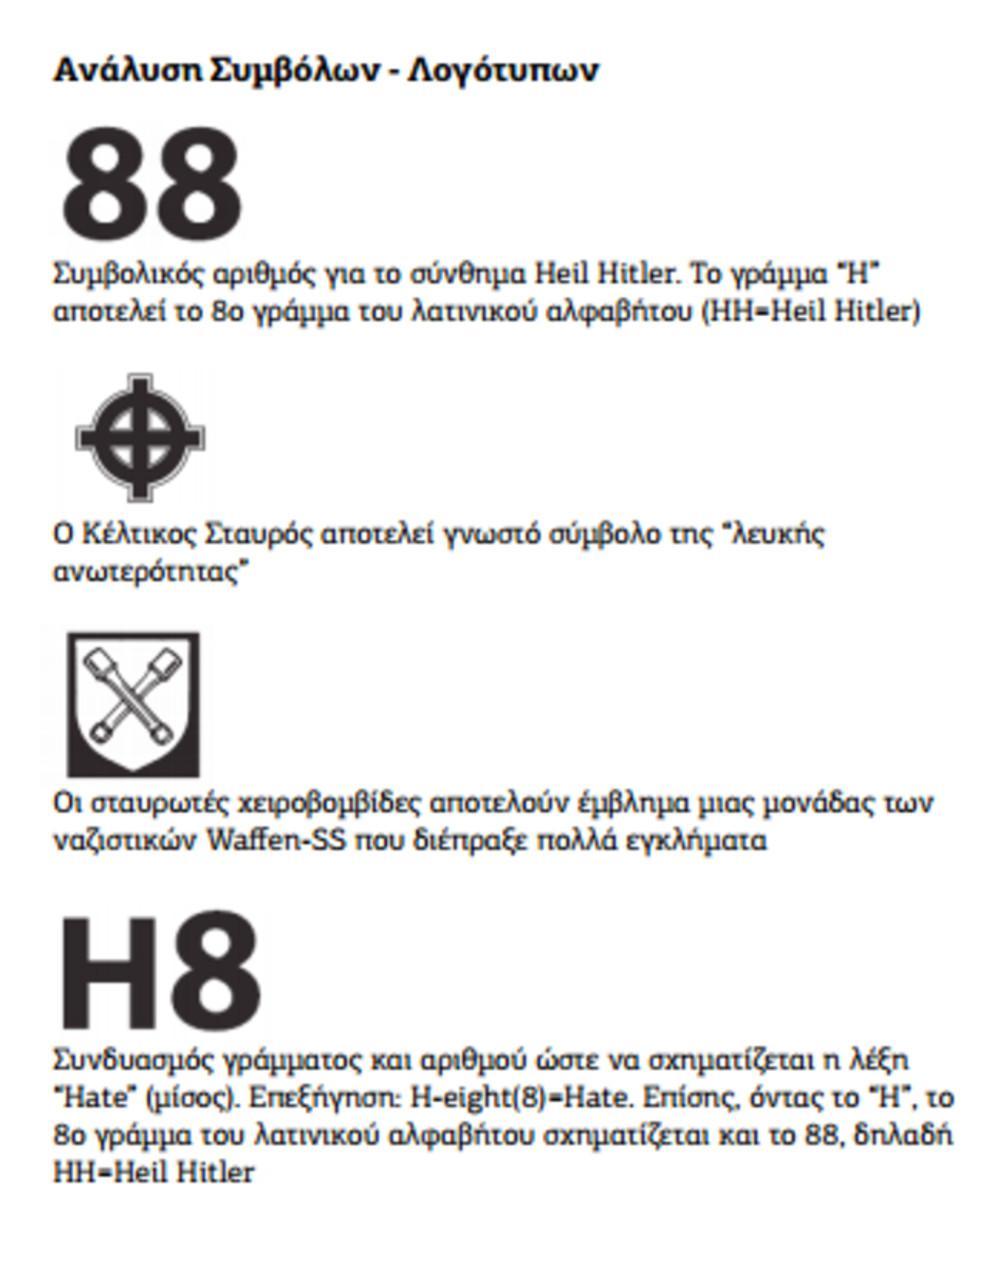 sumvola-akrodeksia Τατουάζ και σύμβολα που «δείχνουν» ακροδεξιά ιδεολογία, στο εγχειρίδιο της ΕΛΑΣ [εικόνες]